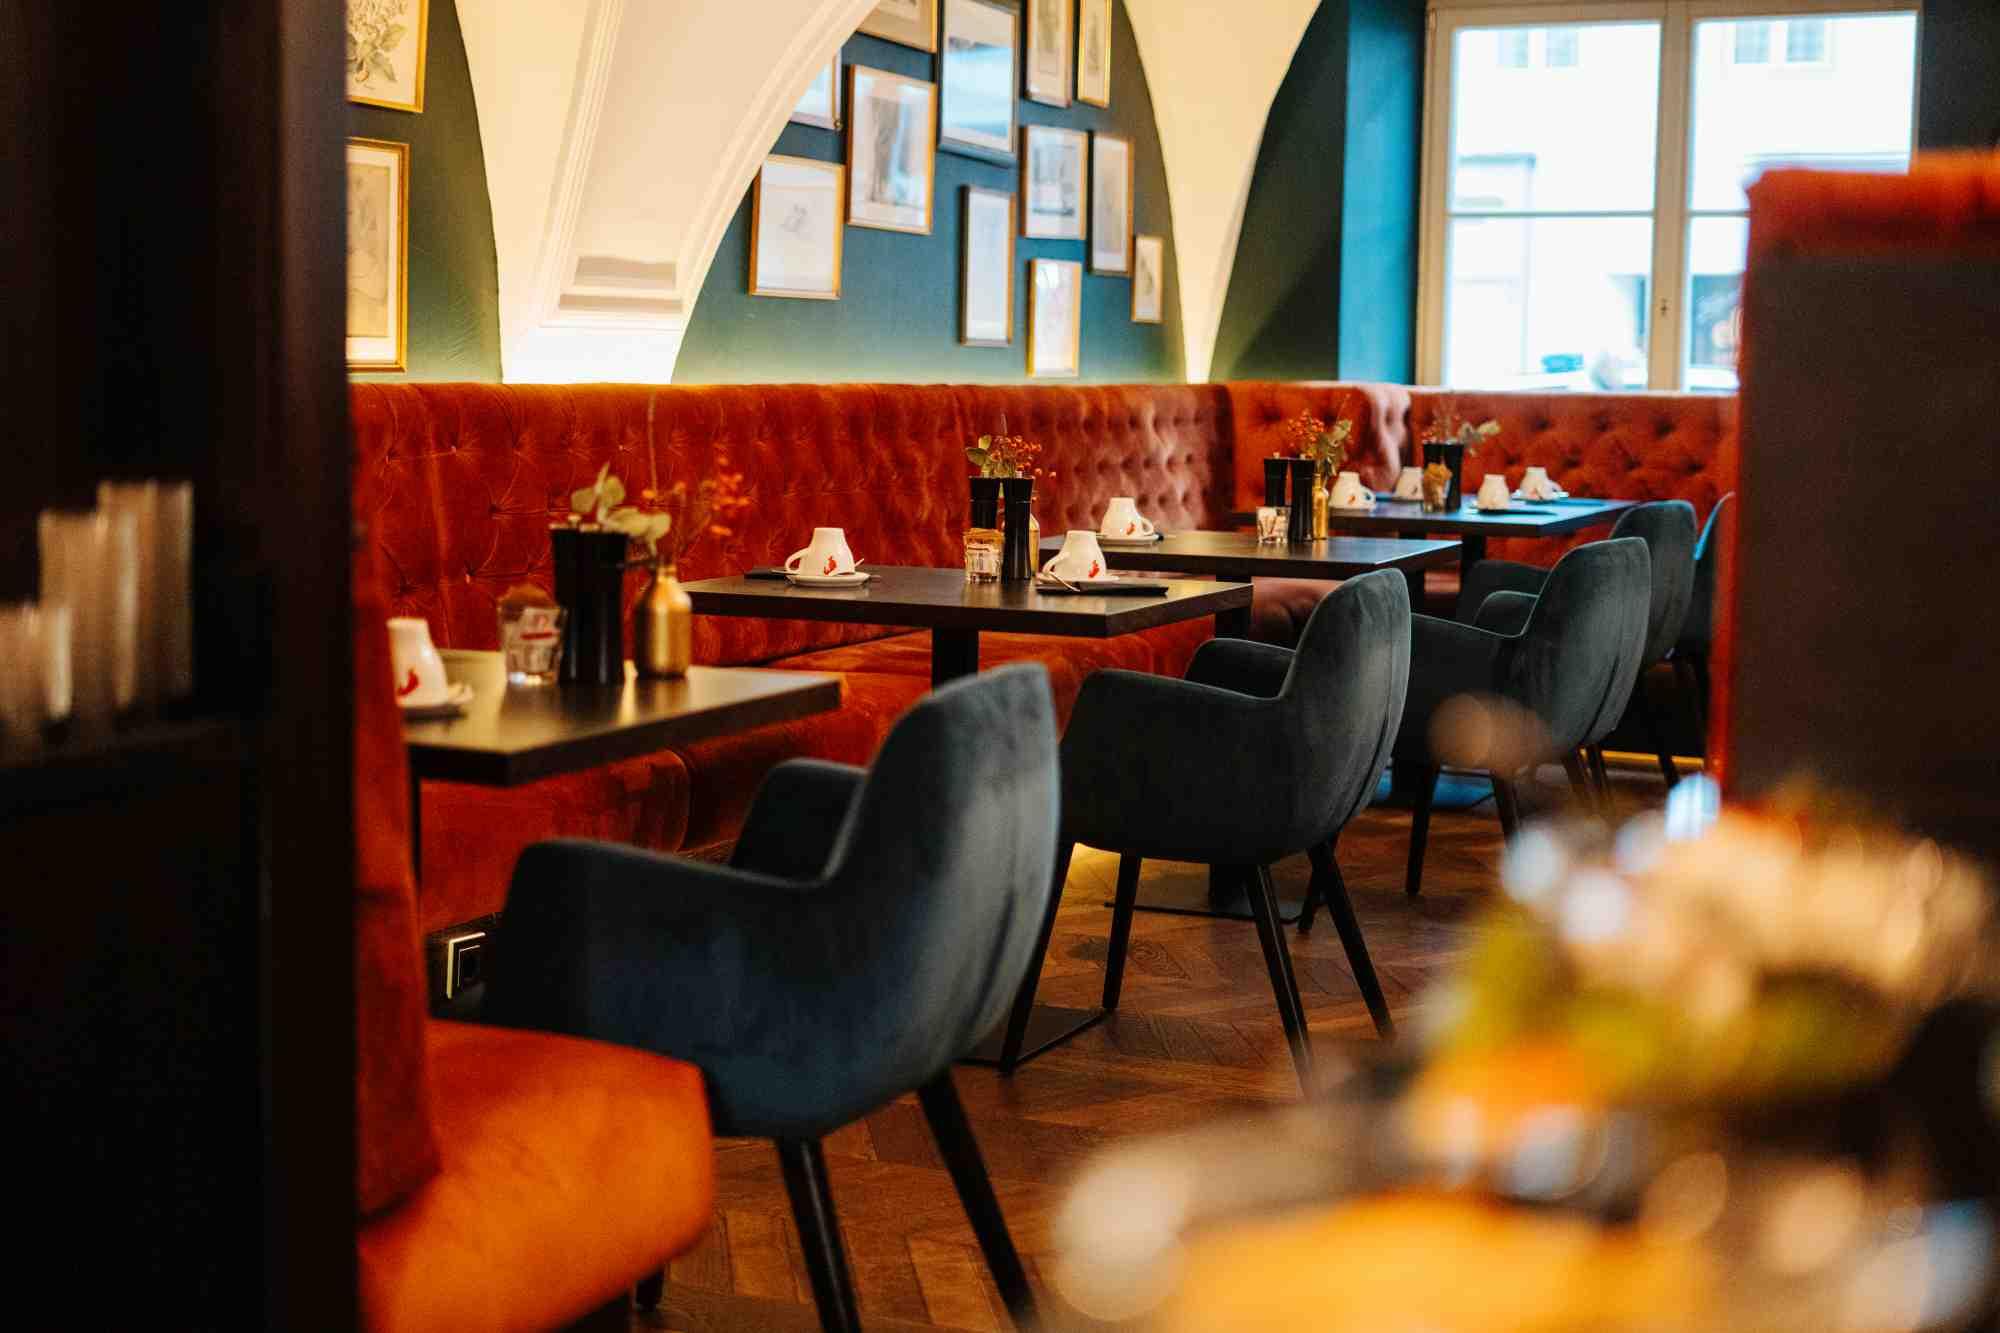 restaurant charles am morgen im hotel palais26 villach